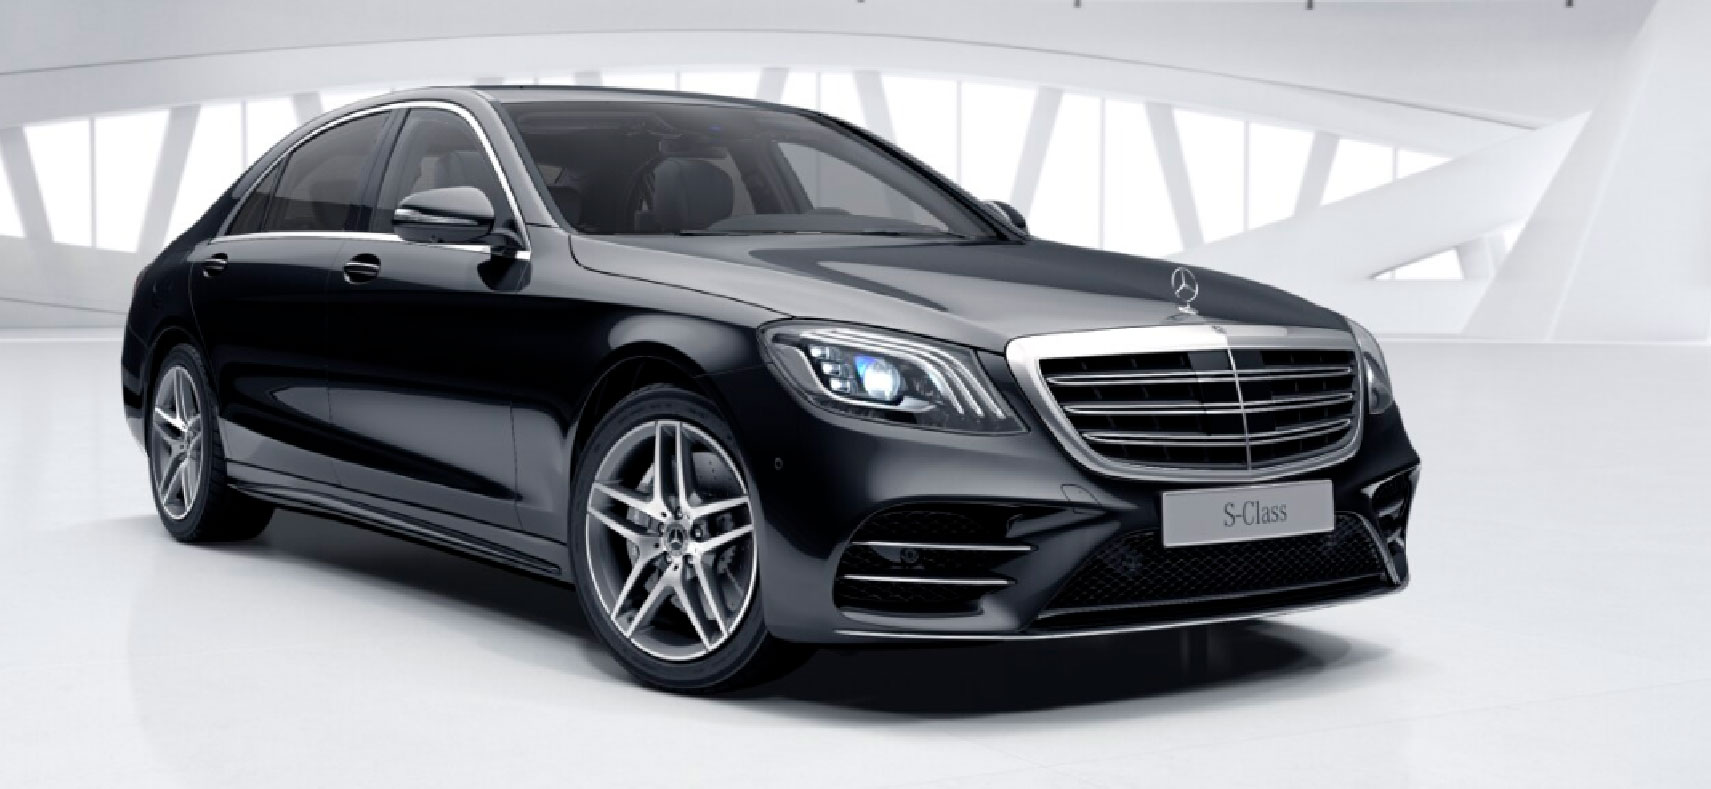 Mercedes-Benz S 560 d 4MATIC long 0052600186